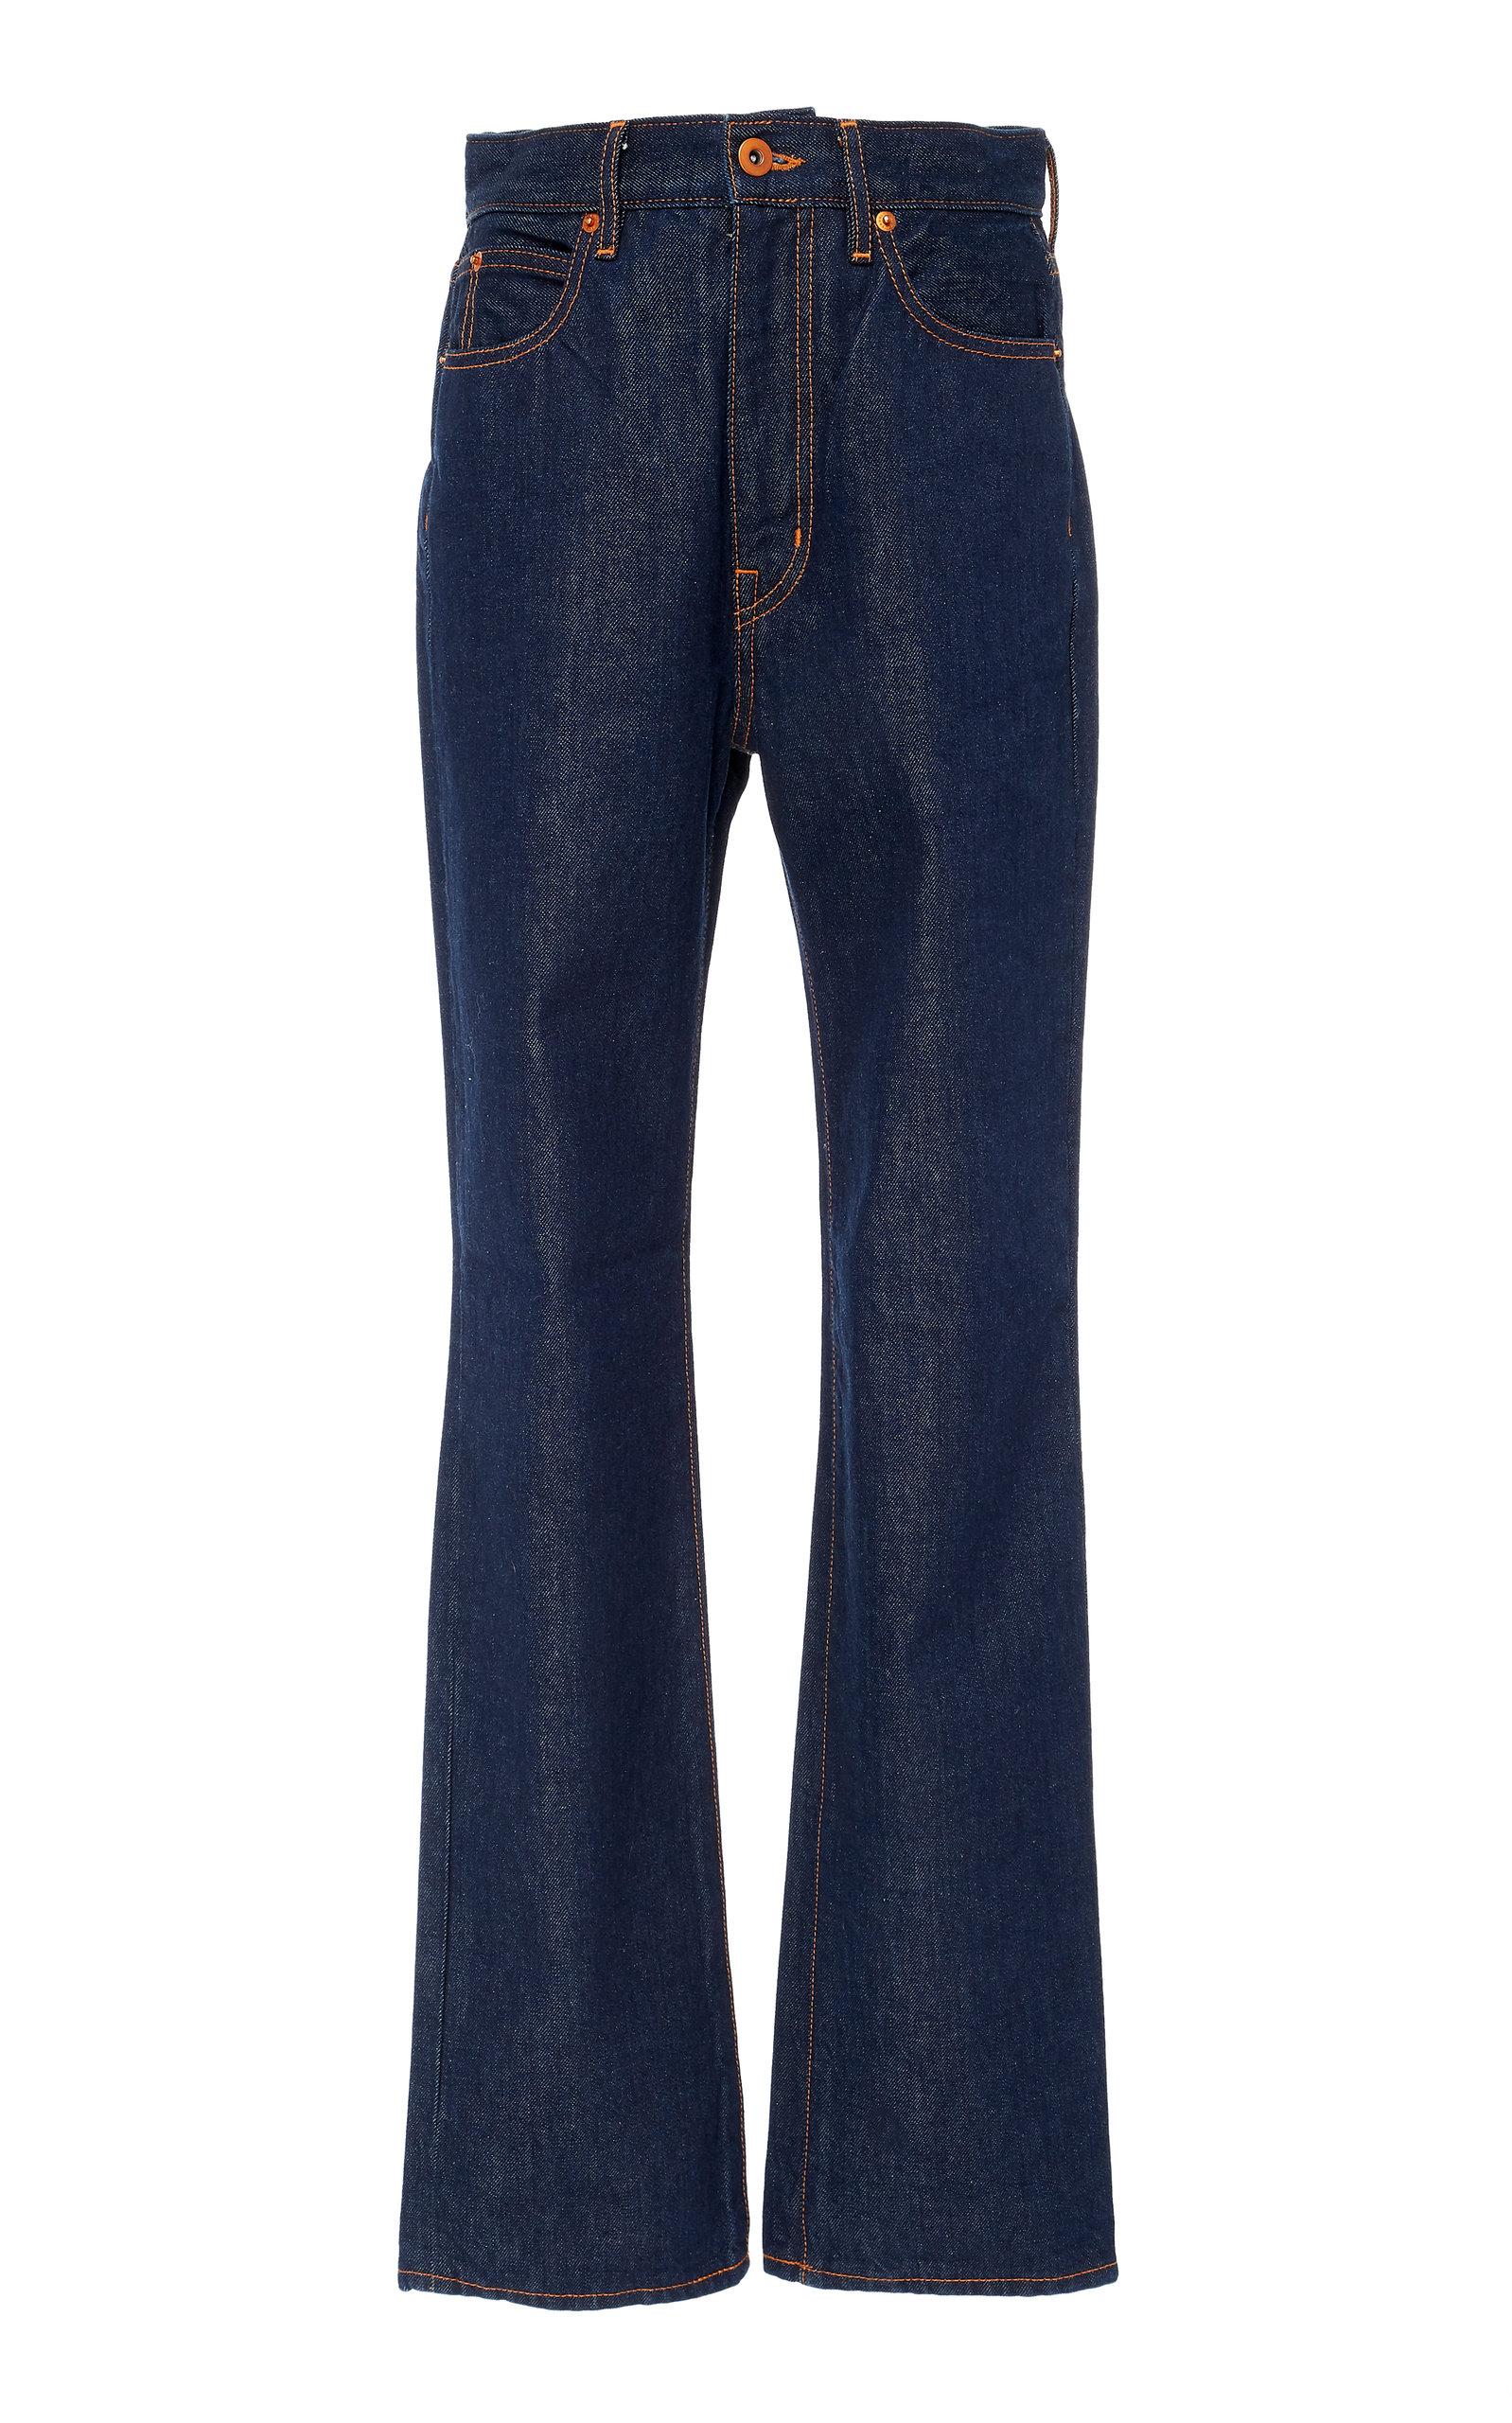 SLVRLAKE DENIM London High-Rise Fit Straight-Leg Jeans in Dark Wash